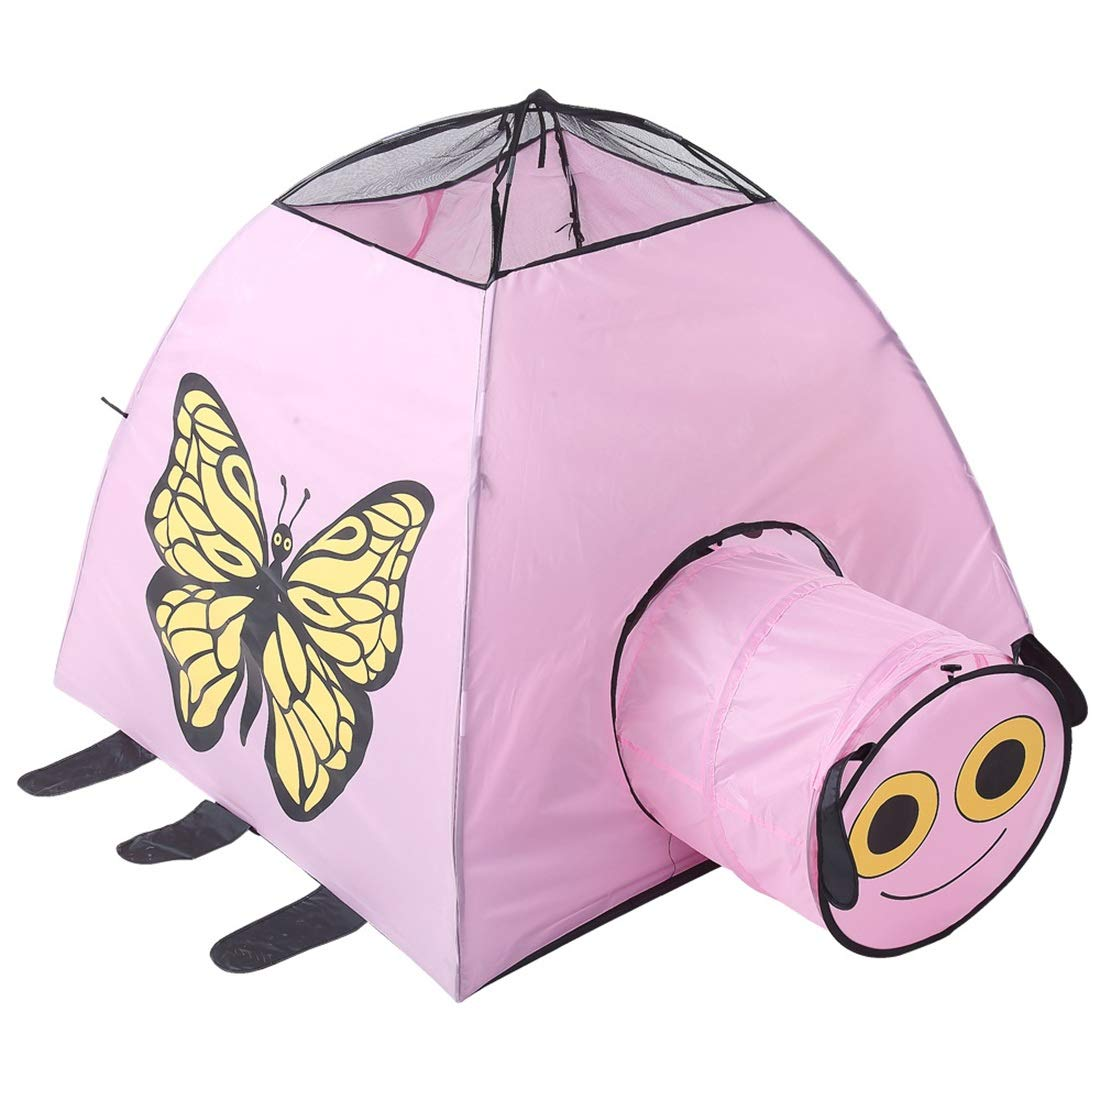 Nekovan キッズFoldable再生テントの蝶プリント子供たちのための屋内屋外のおもちゃの劇場男の子と女の子 (色 : ピンク) B07R7H9DHG ピンク